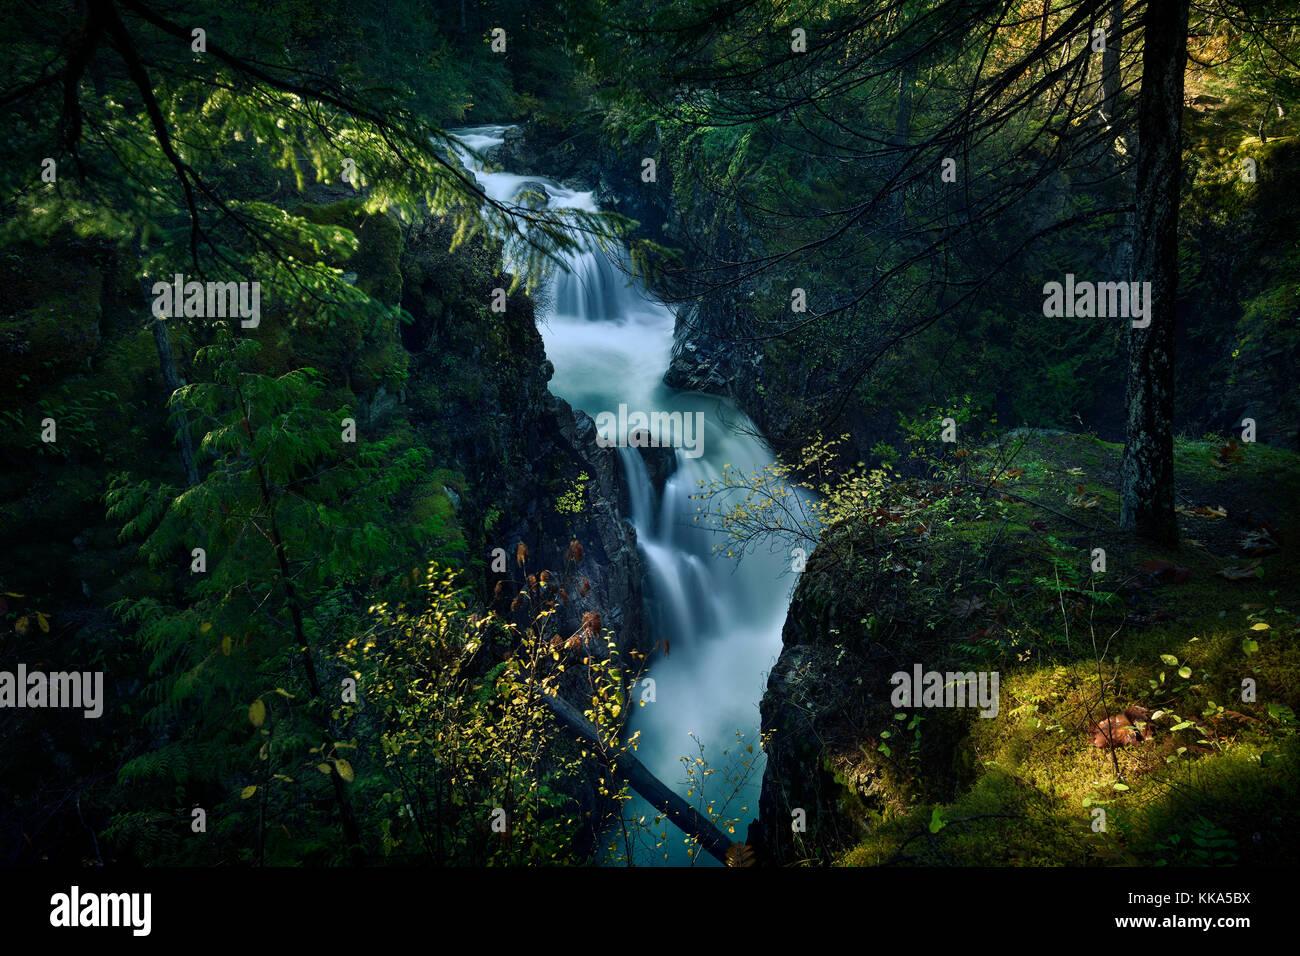 Little Qualicum Falls Provincial Park beautiful cascade waterfall autumn nature scenery, Little Qualicum River, Stock Photo